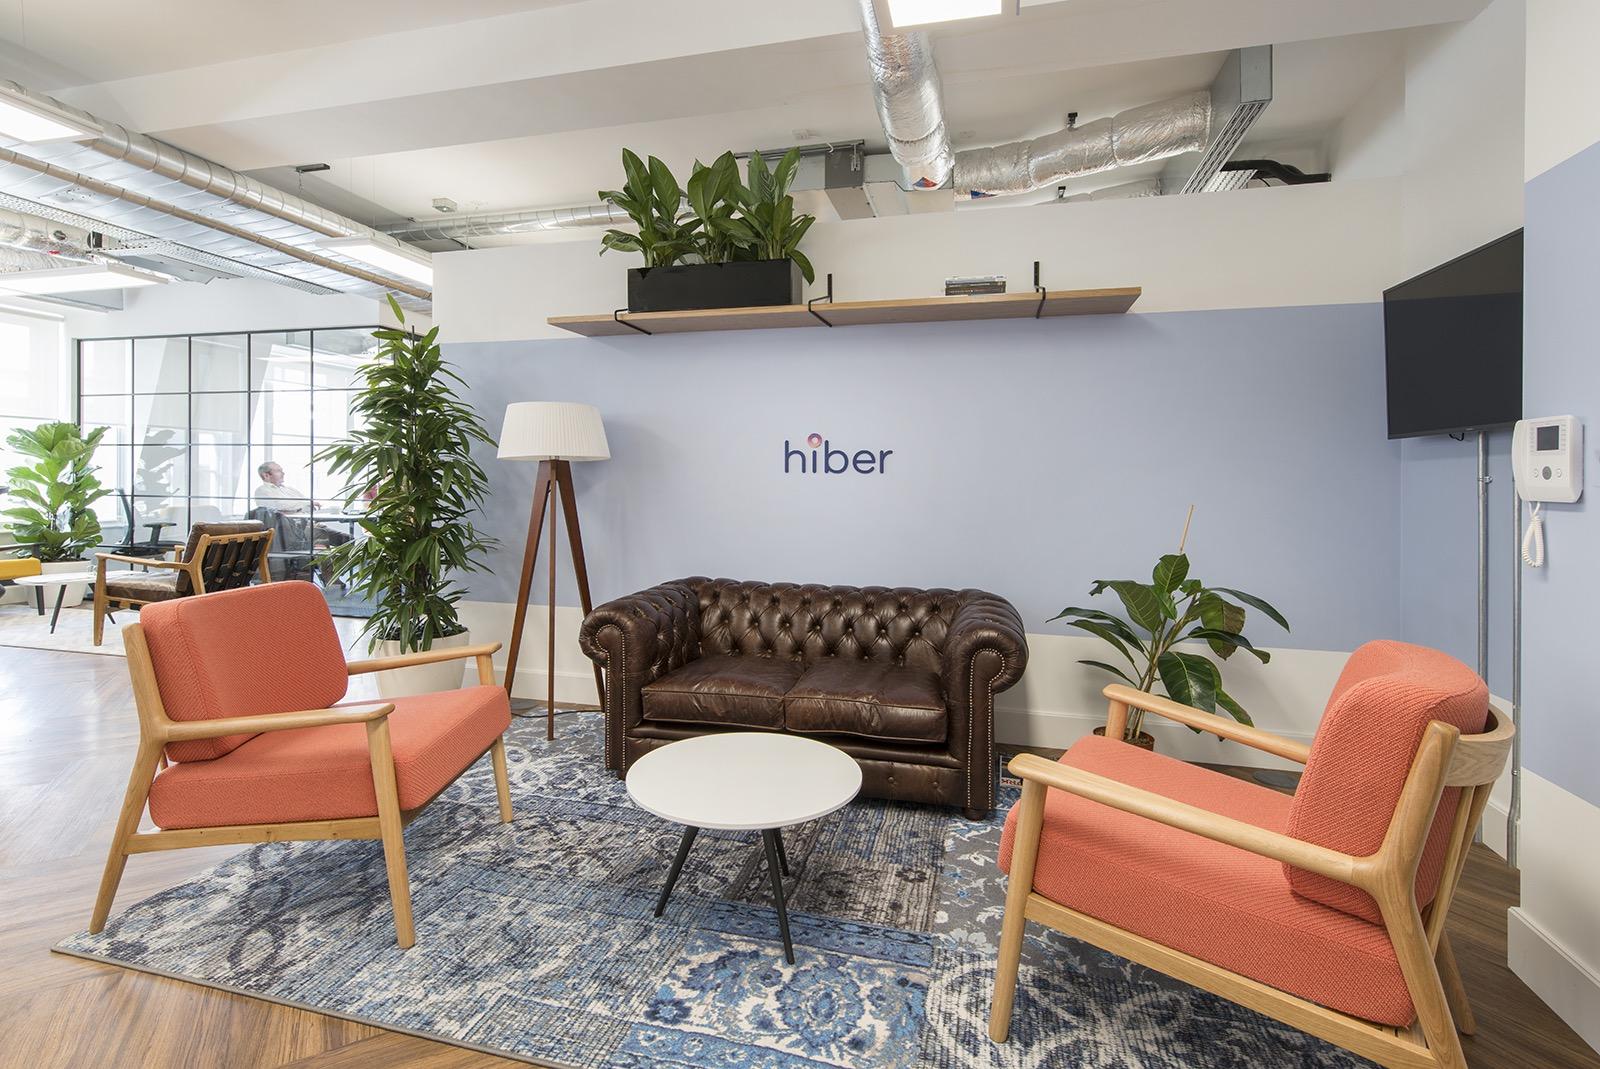 hiber-london-office-1